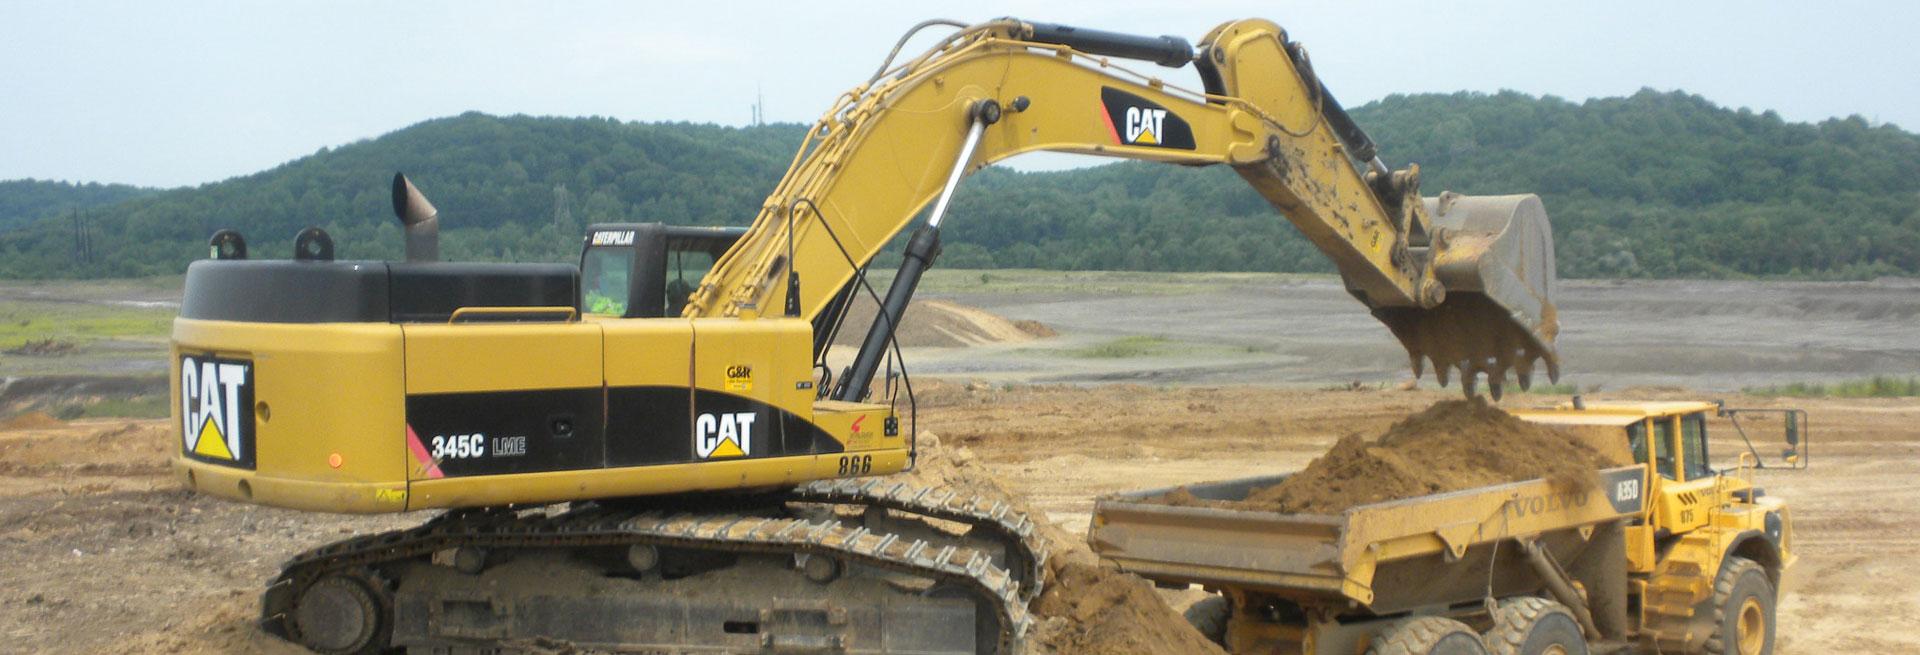 sibymining excavation work